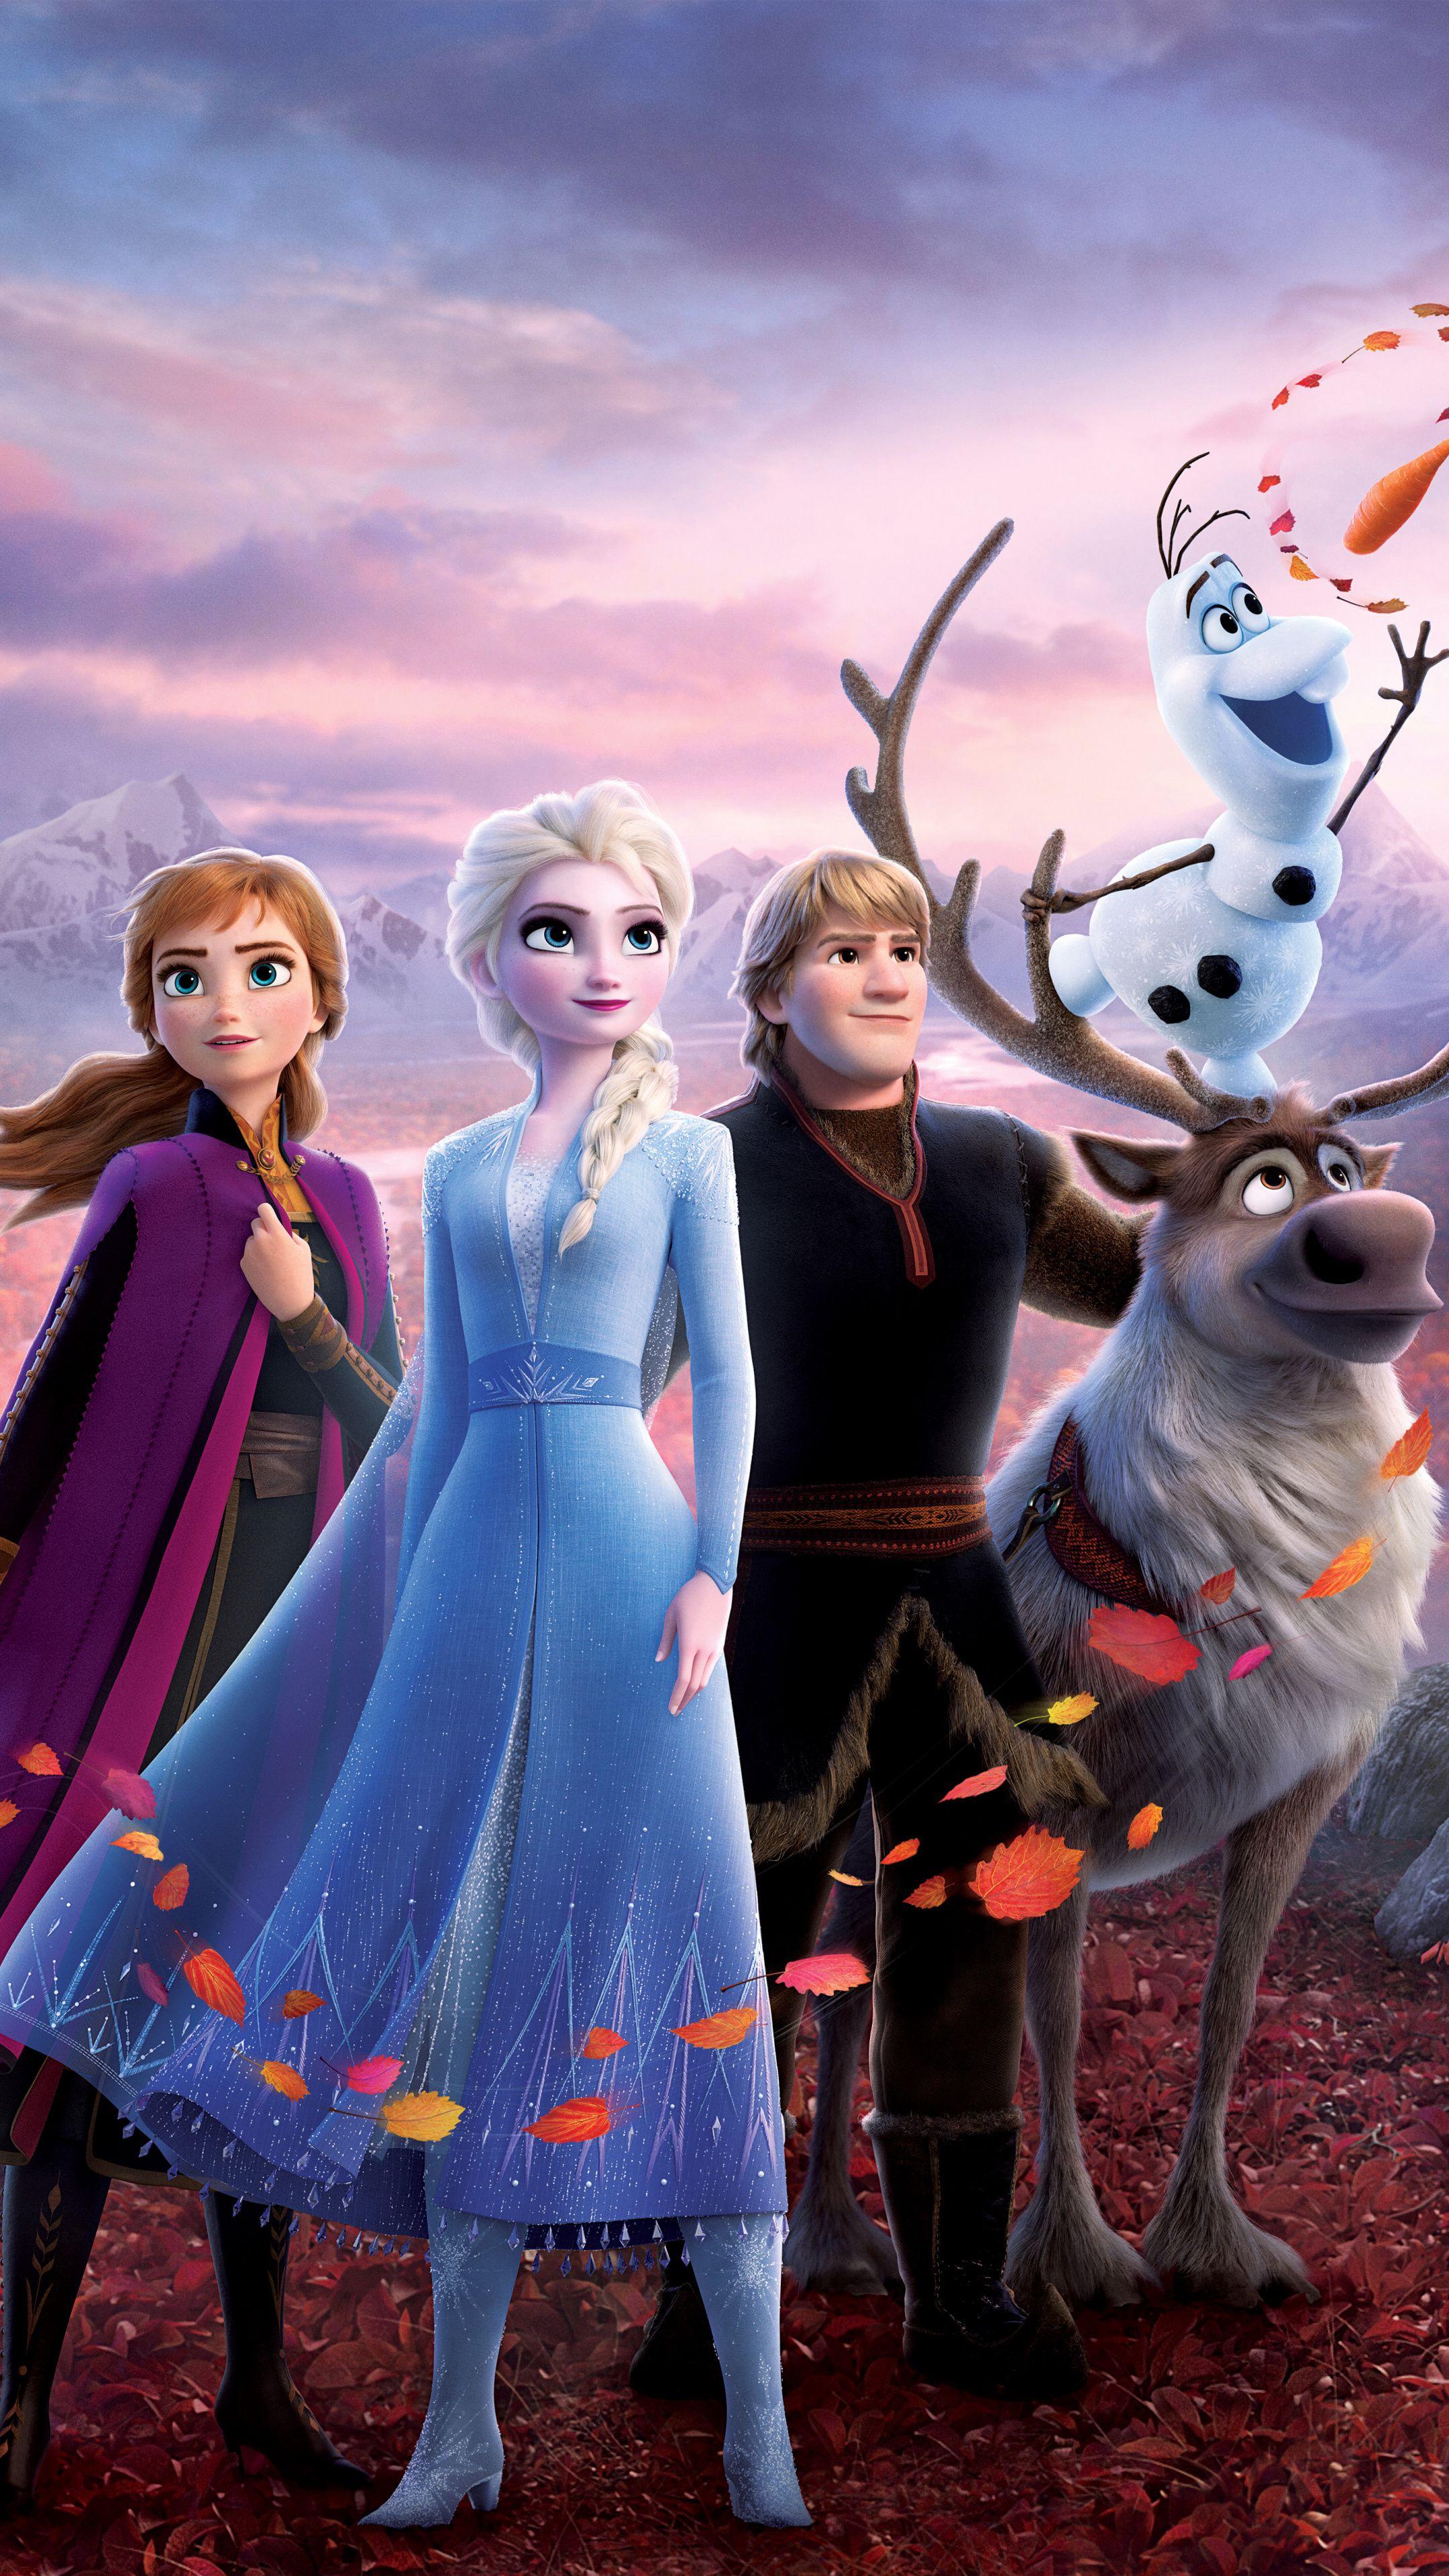 Download 2160x3840 Wallpaper Movie Disney S Animation Movie Frozen 2 Sisters 4k Sony Xperi In 2020 Disney Princess Frozen Disney Princess Pictures Frozen Pictures